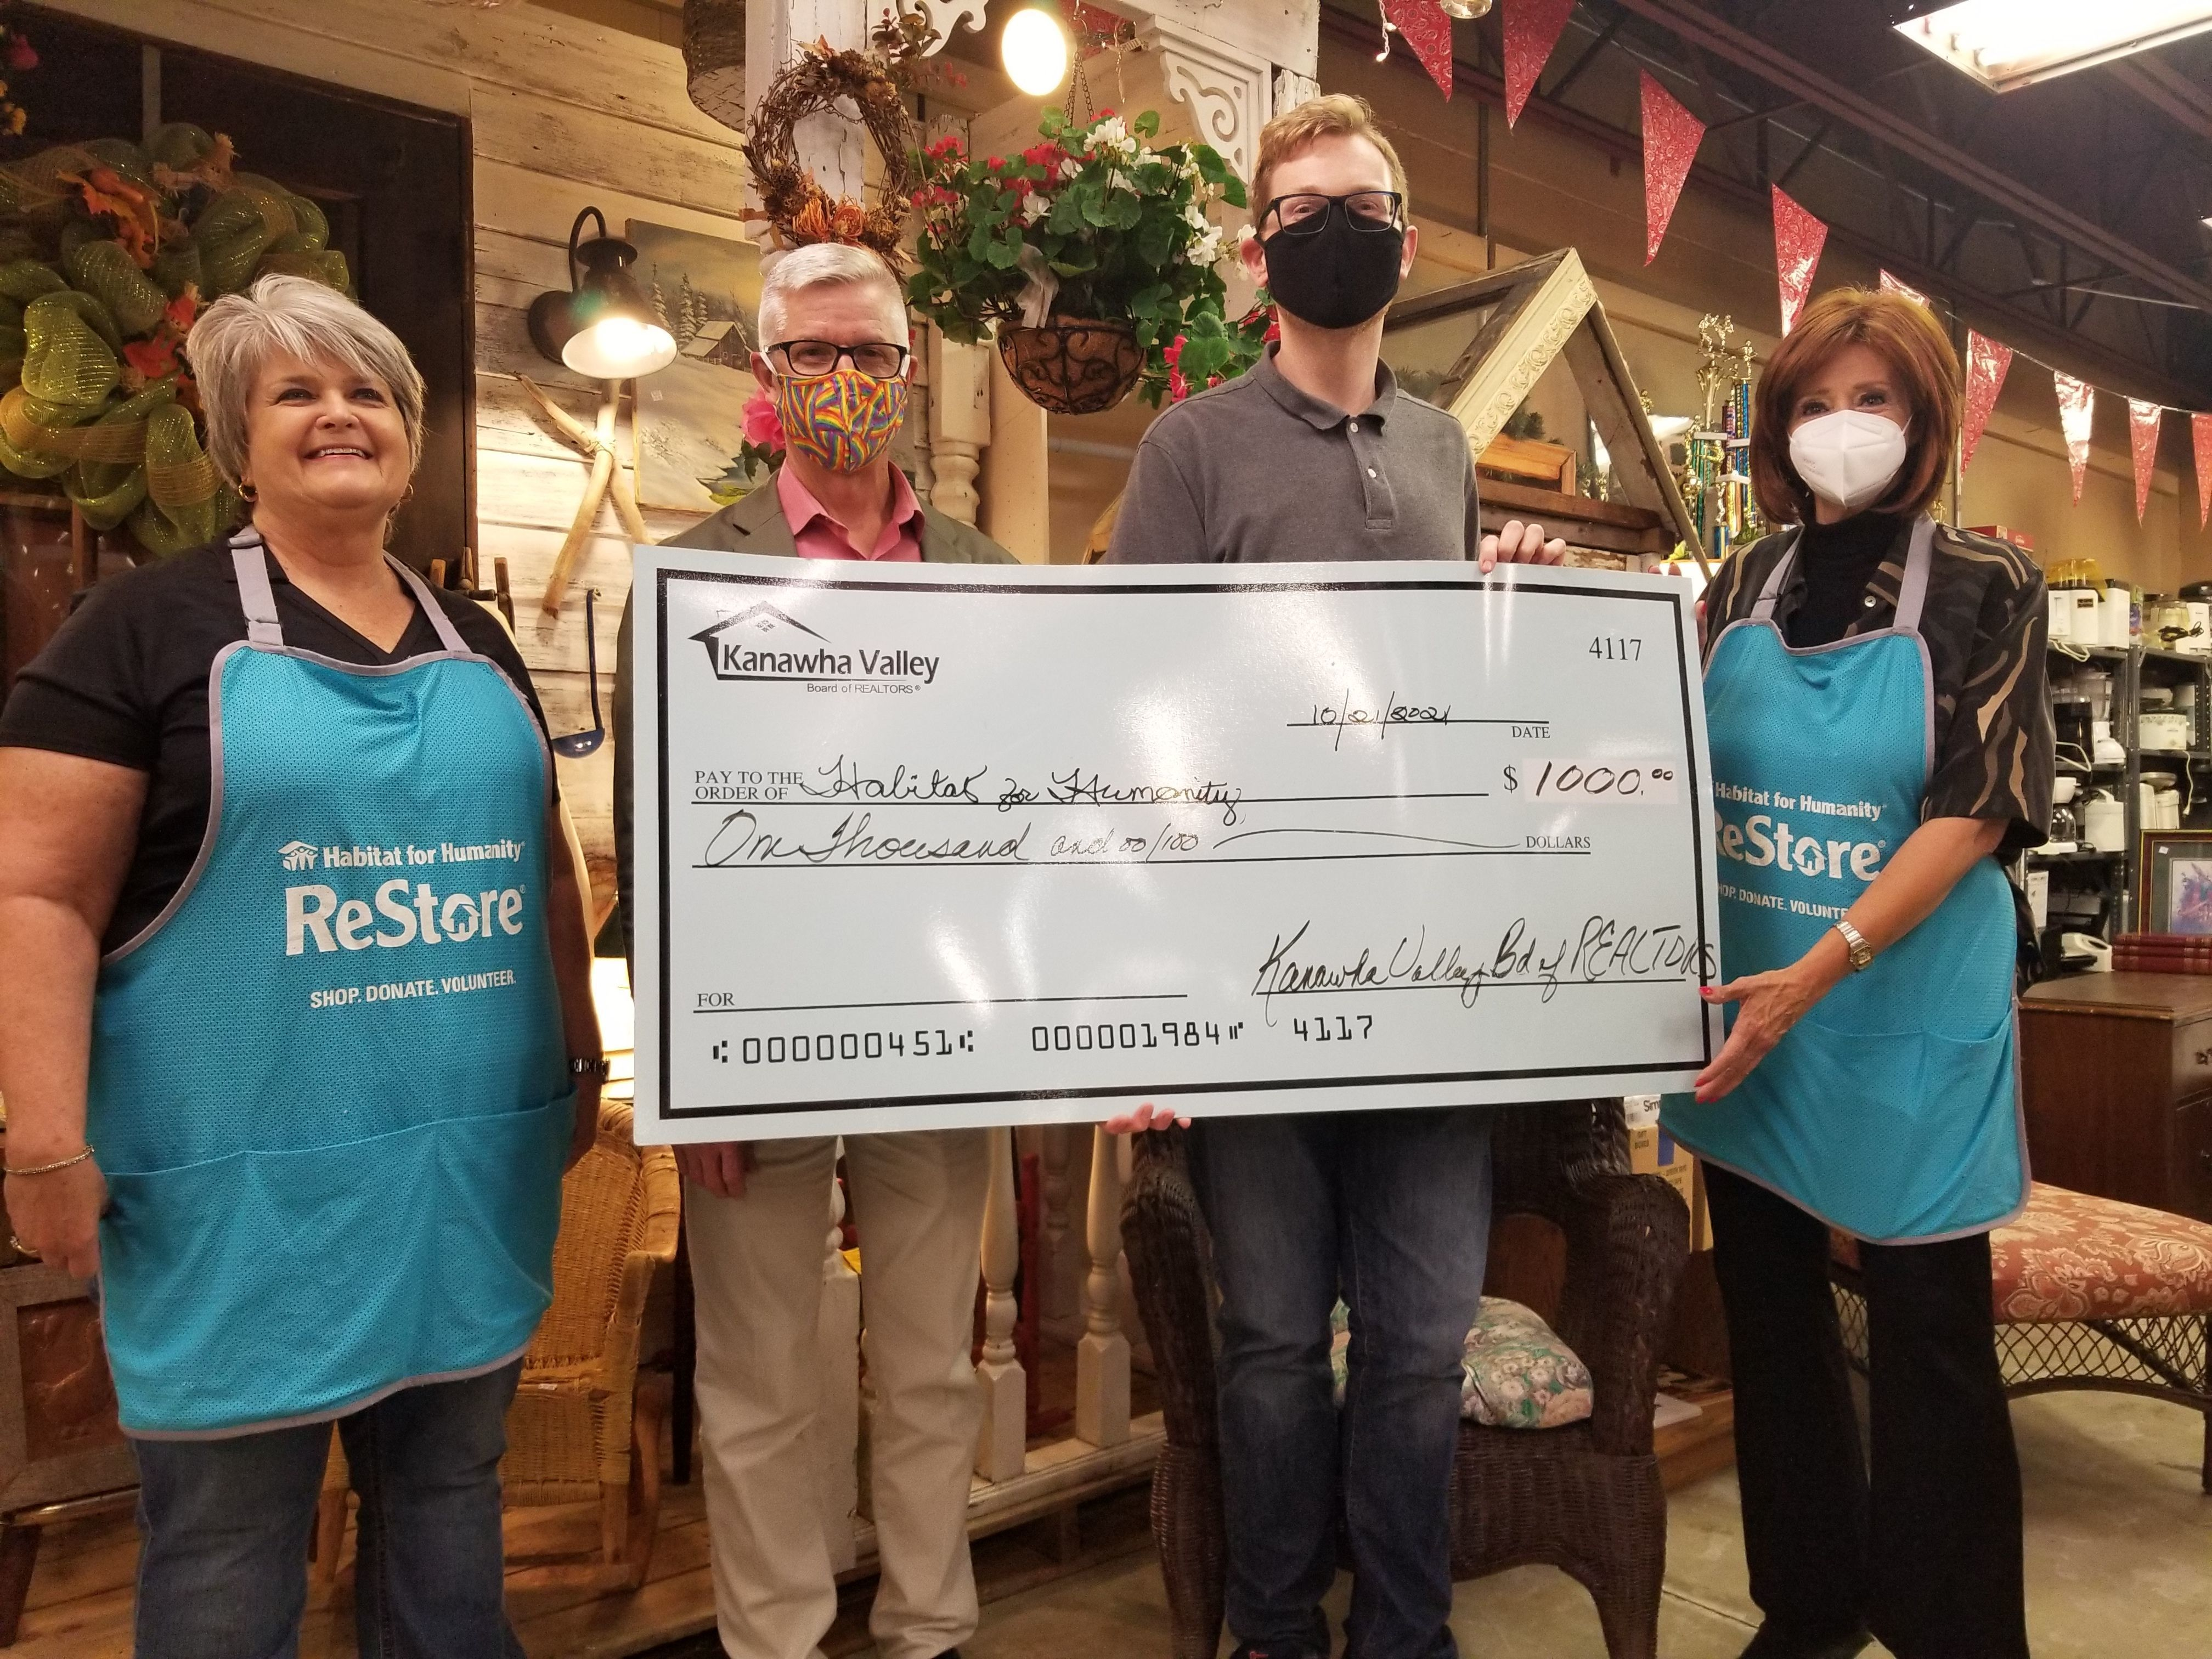 Kanawha Valley Board of Realtors Donates $1,000  and volunteer labor to Habitat